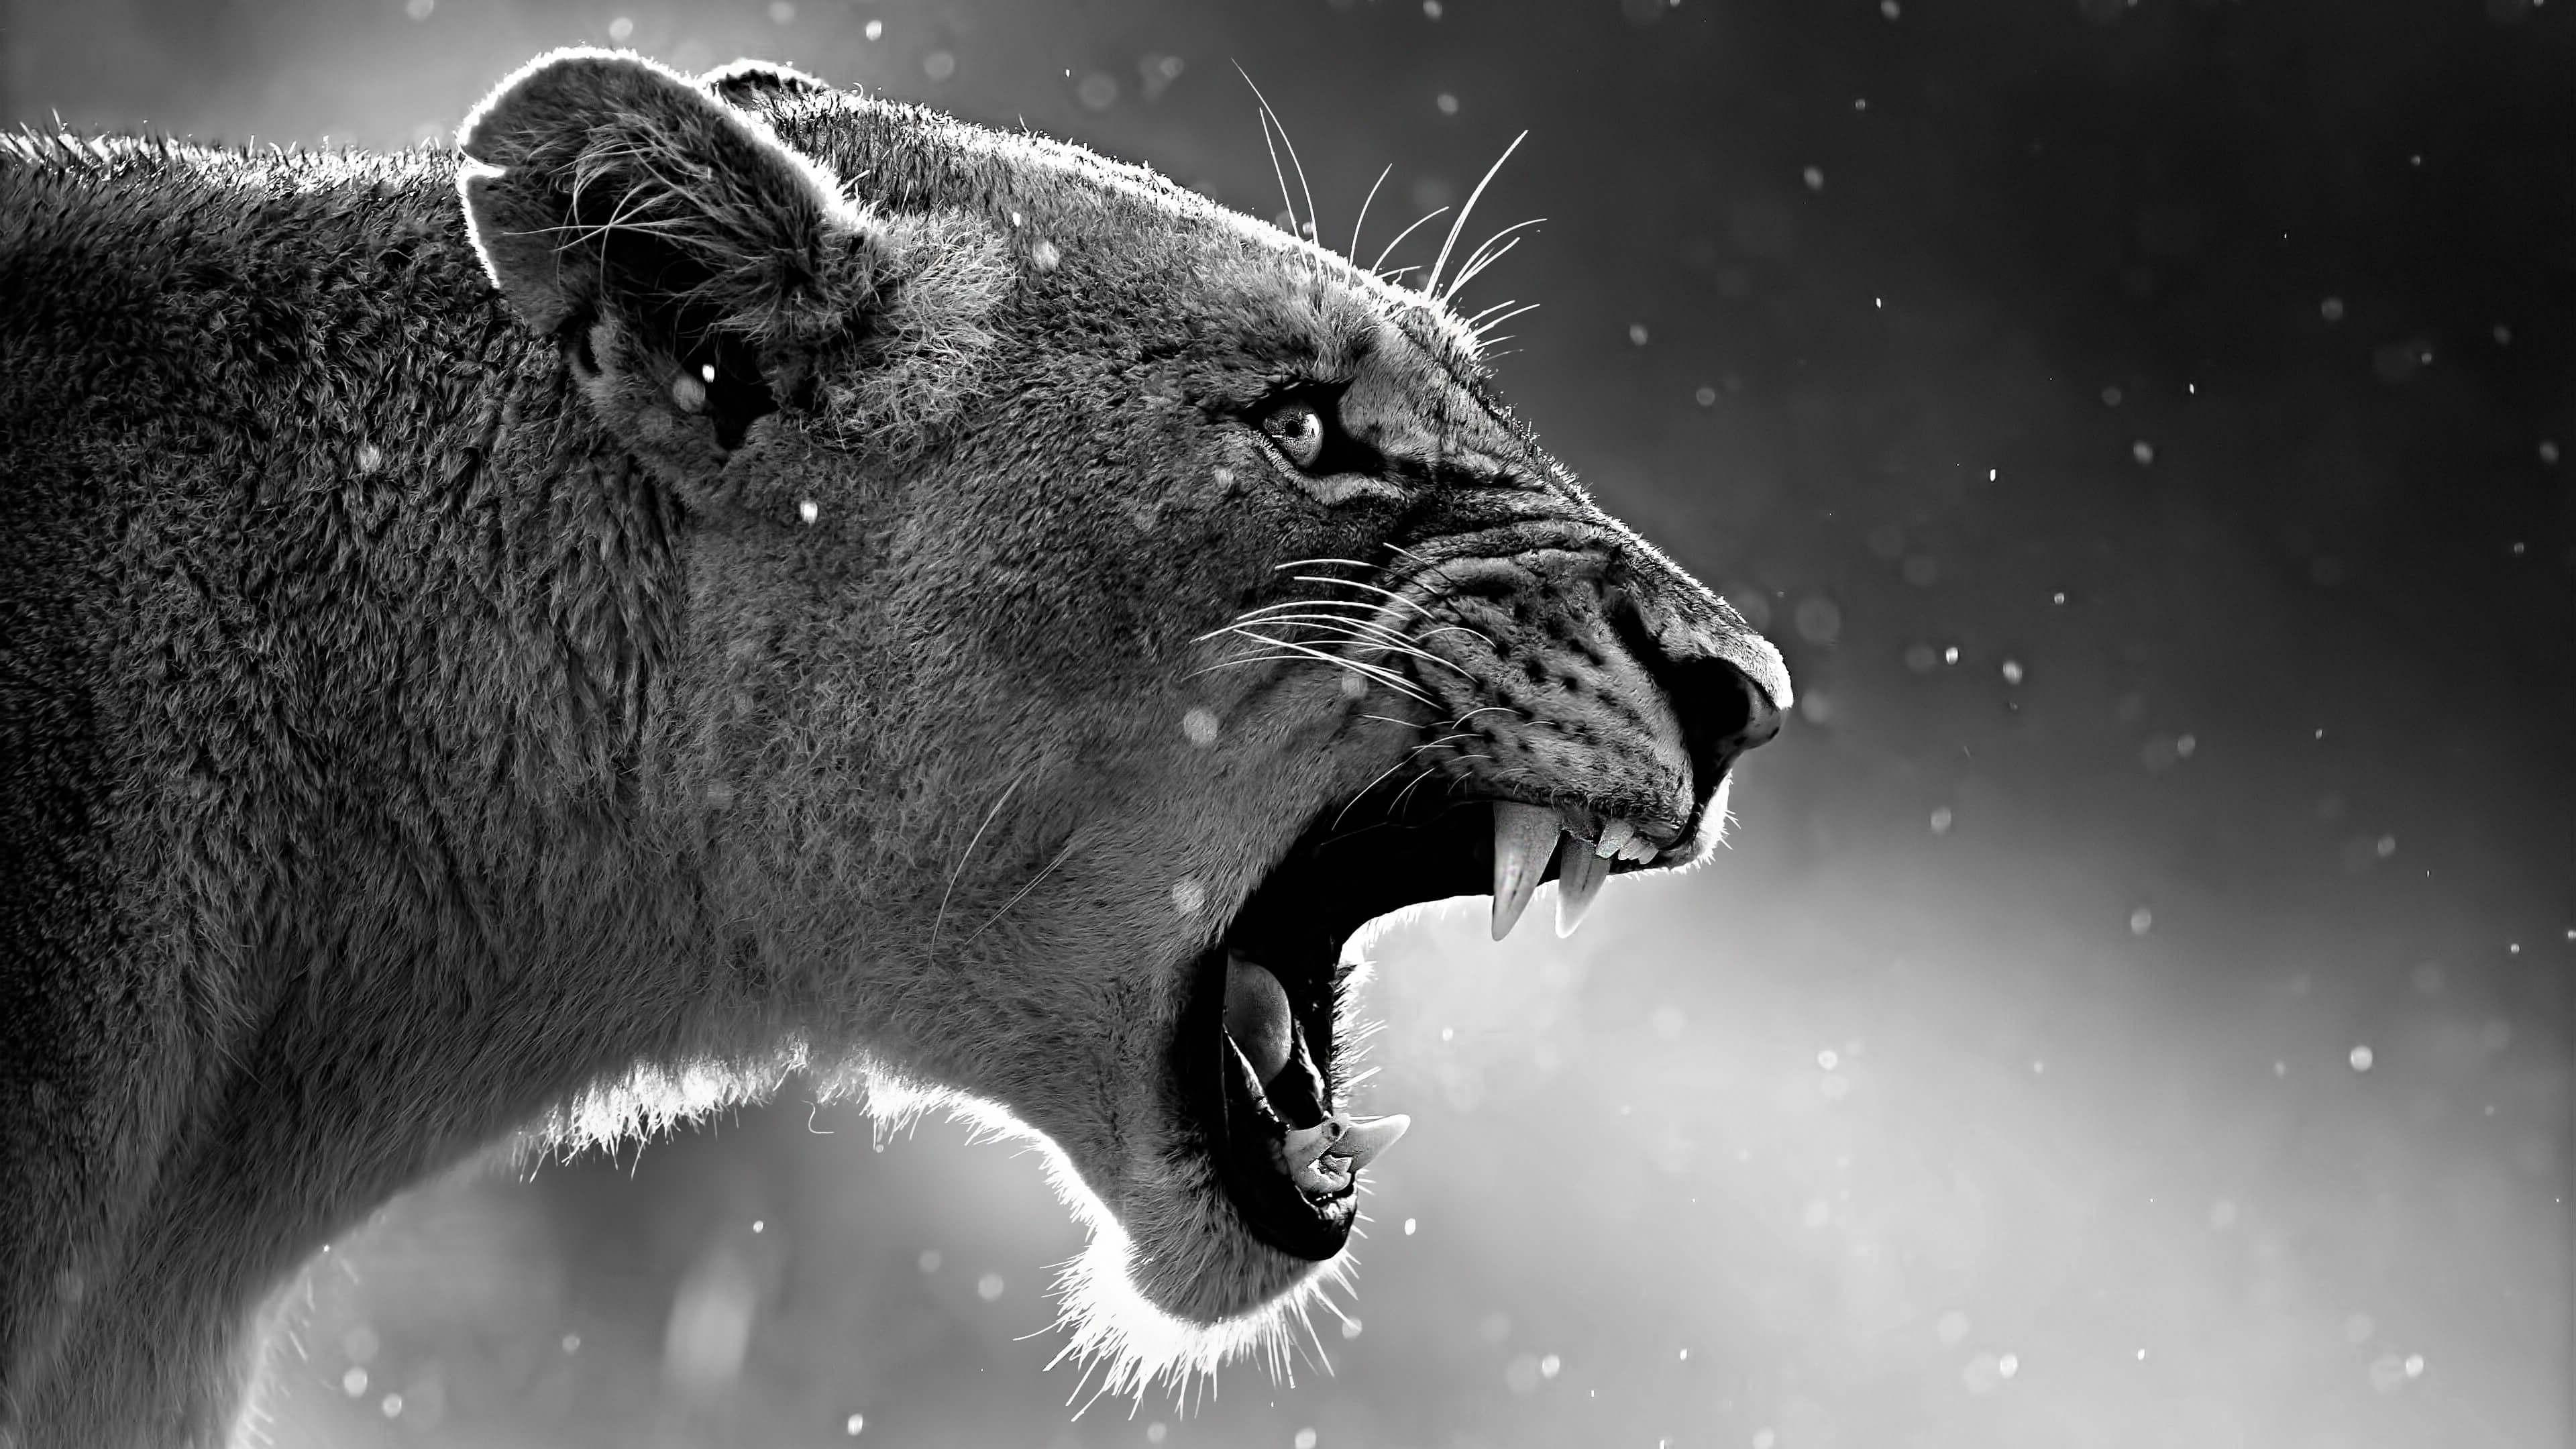 Lion roaring hd animals 4k wallpapers images - Lion 4k wallpaper for mobile ...